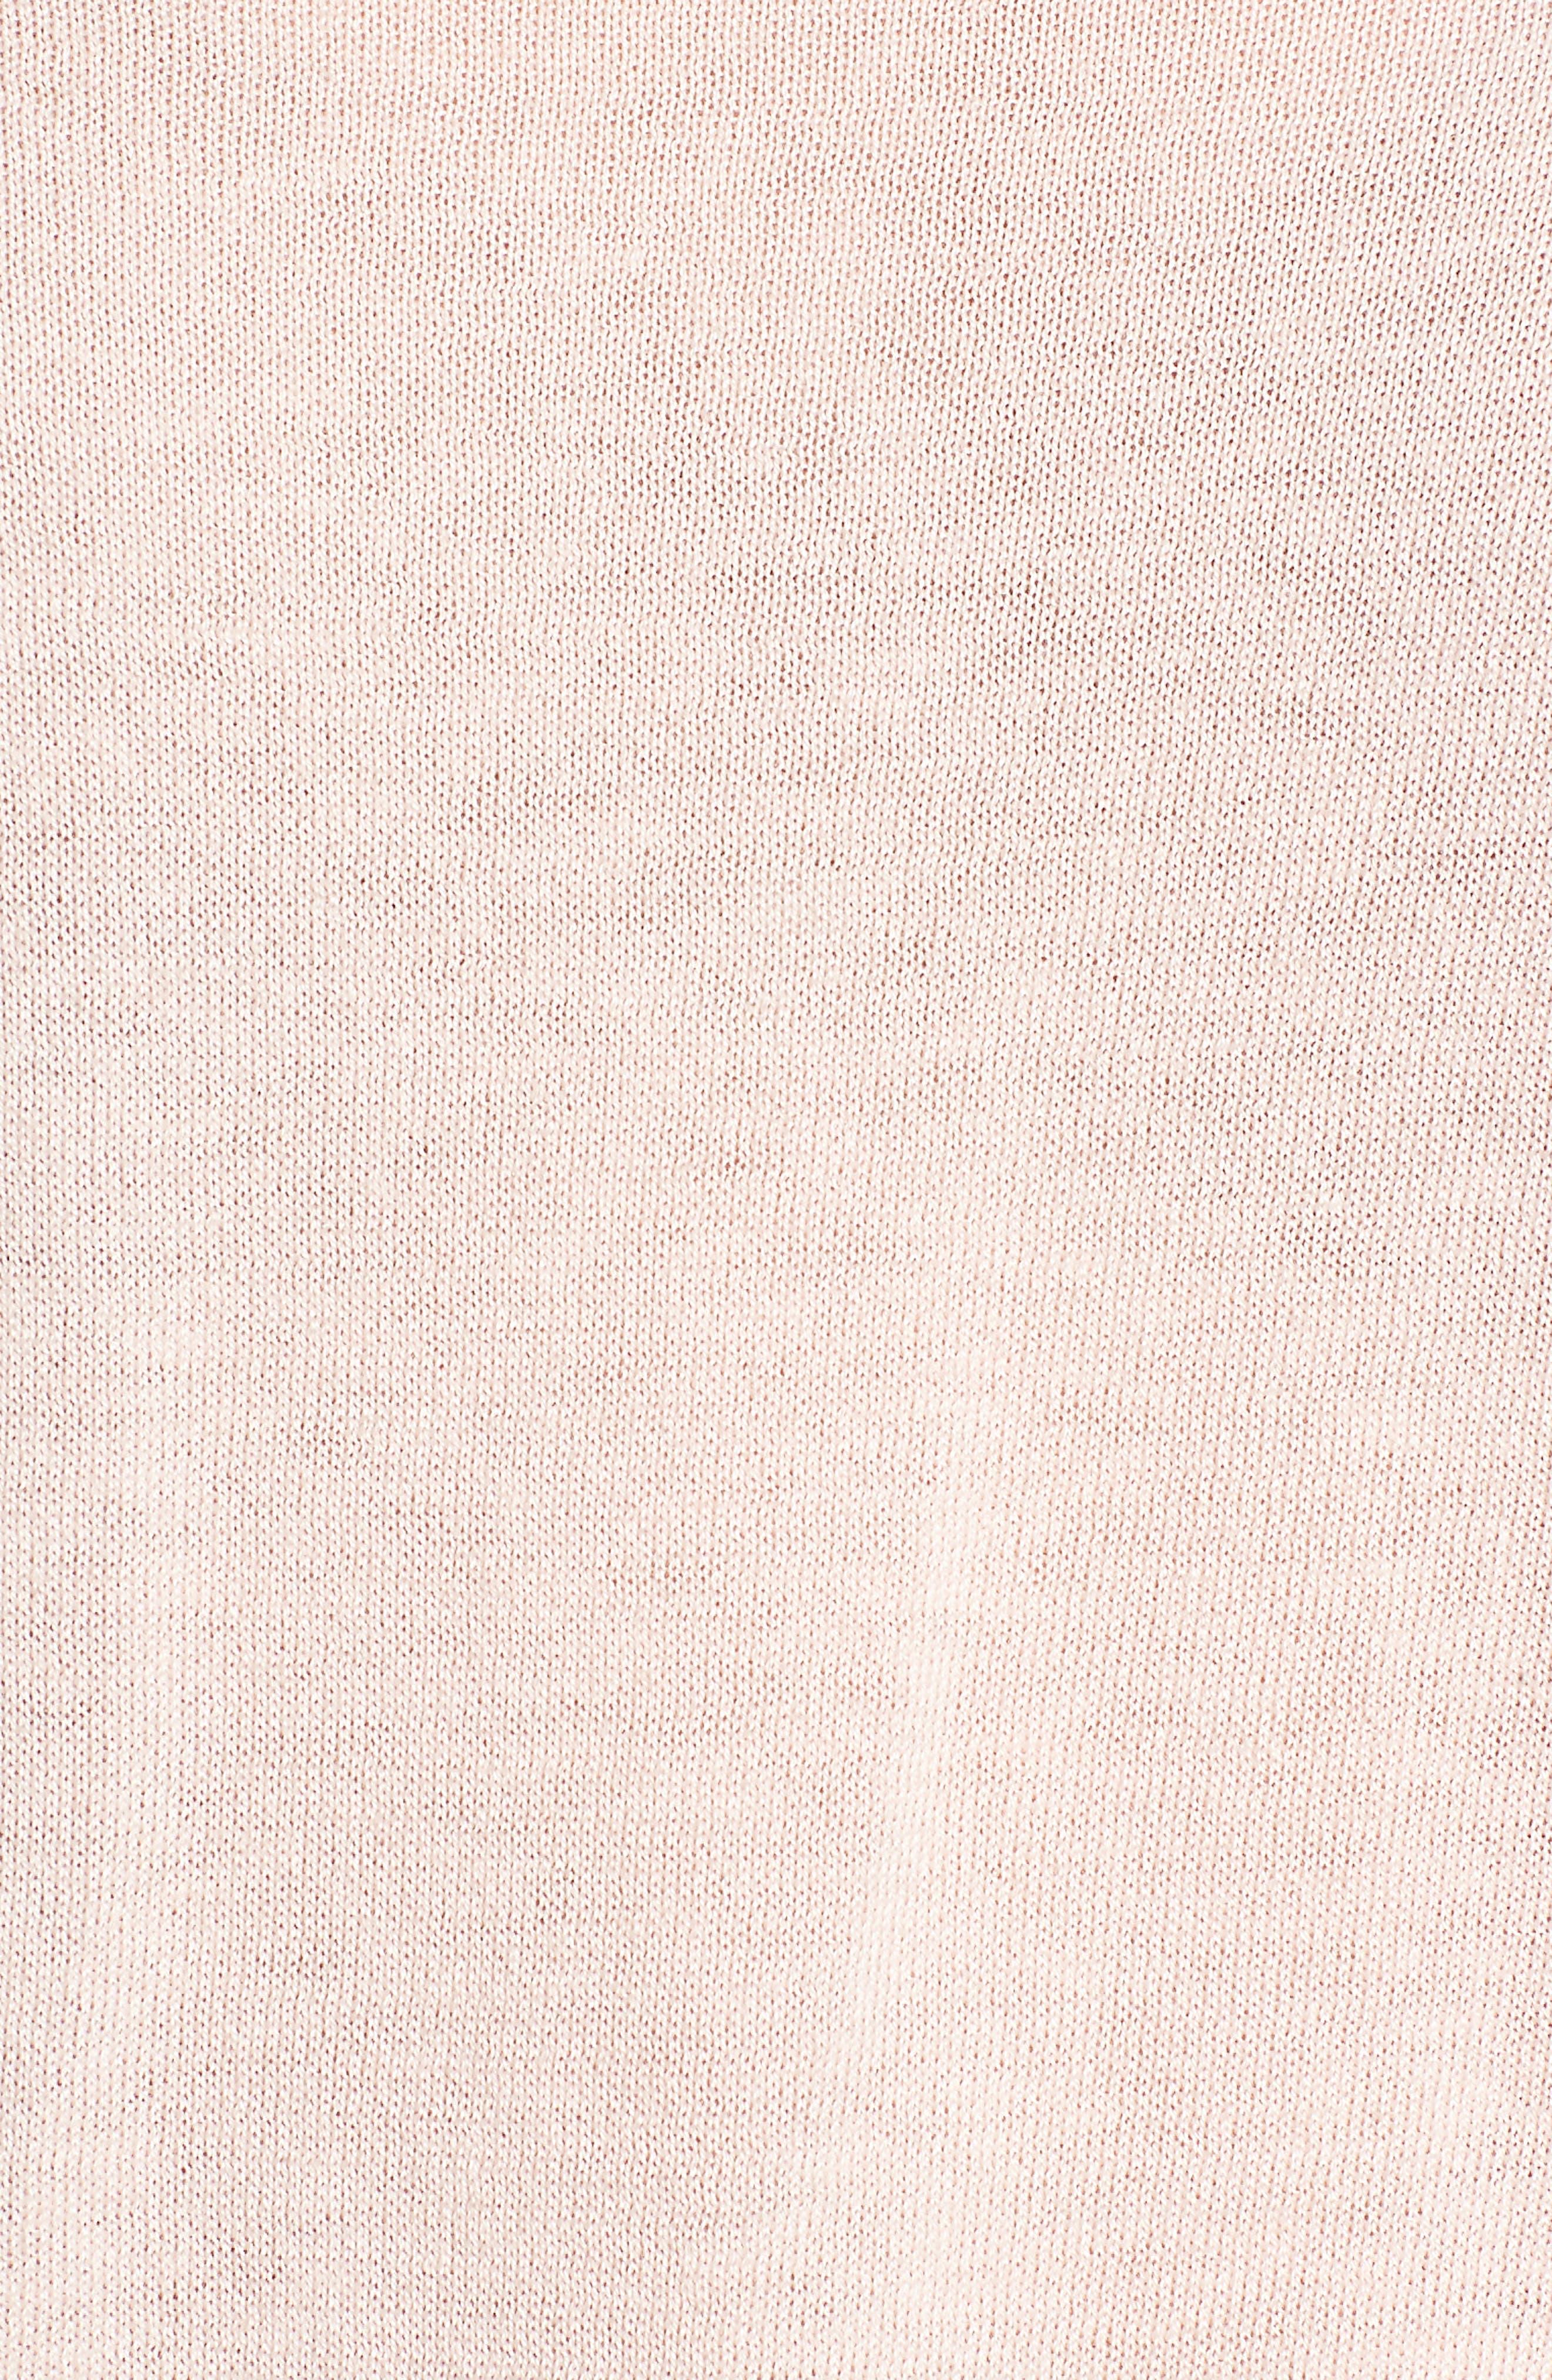 Convertible Bateau Neck Sweater,                             Alternate thumbnail 5, color,                             Pink Peach